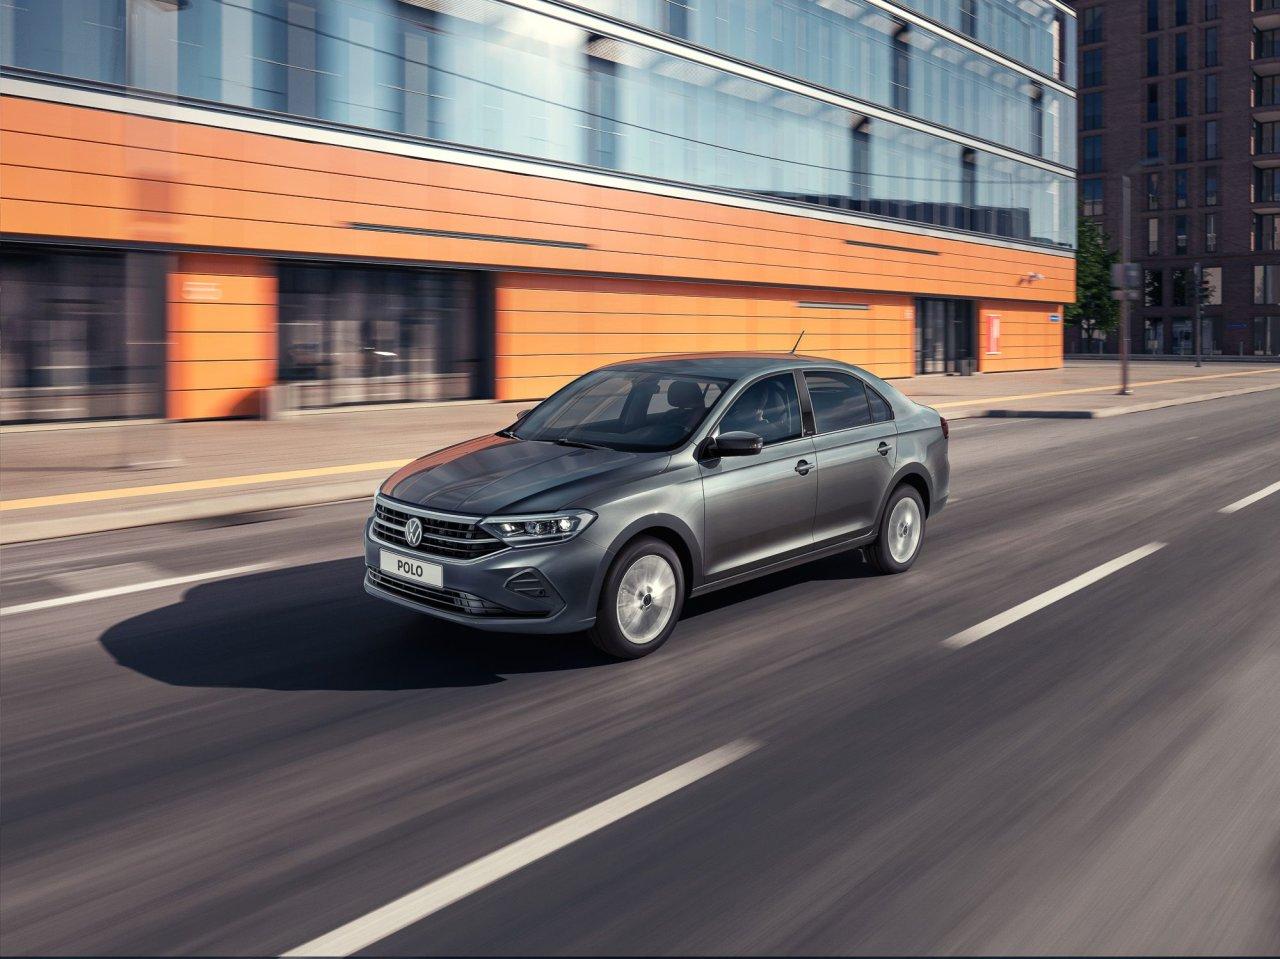 Начался прием заказов на новый Volkswagen Polo